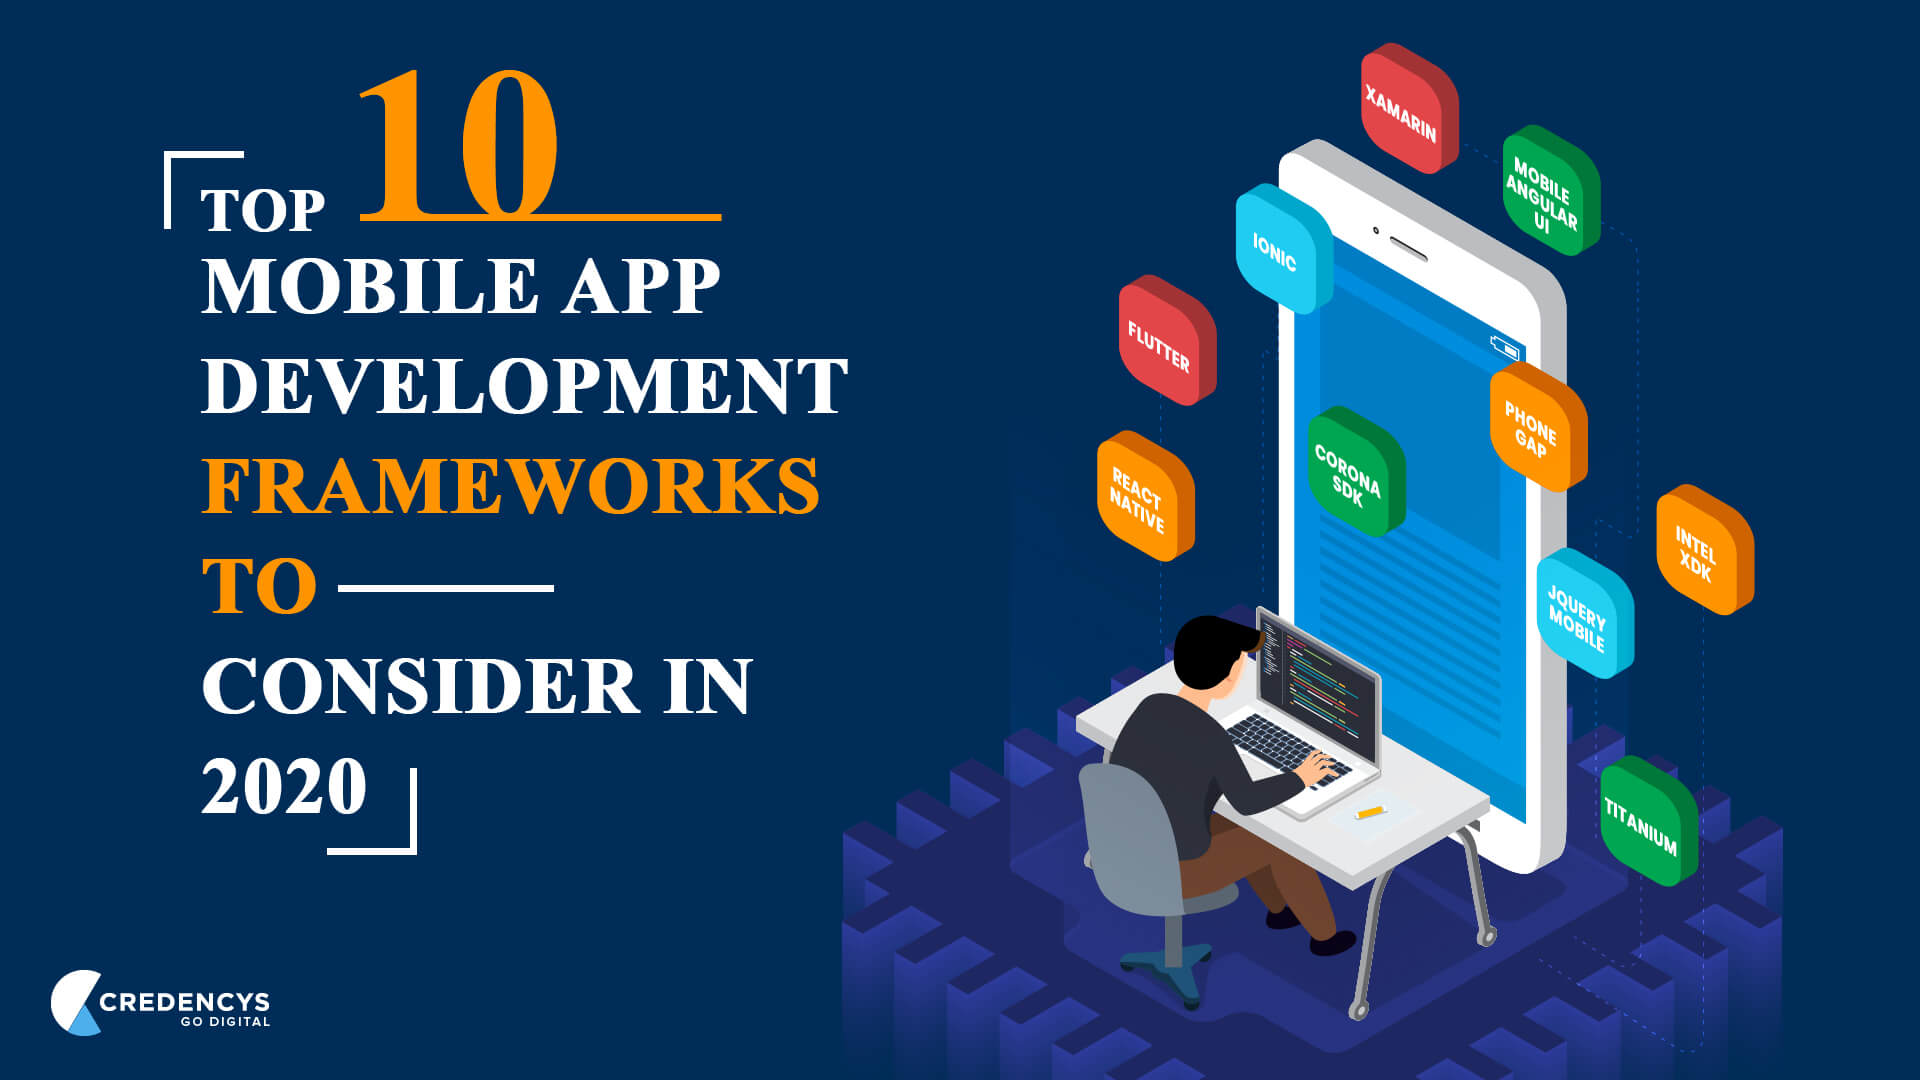 Top 10 Mobile App Development Frameworks to Consider in 2020